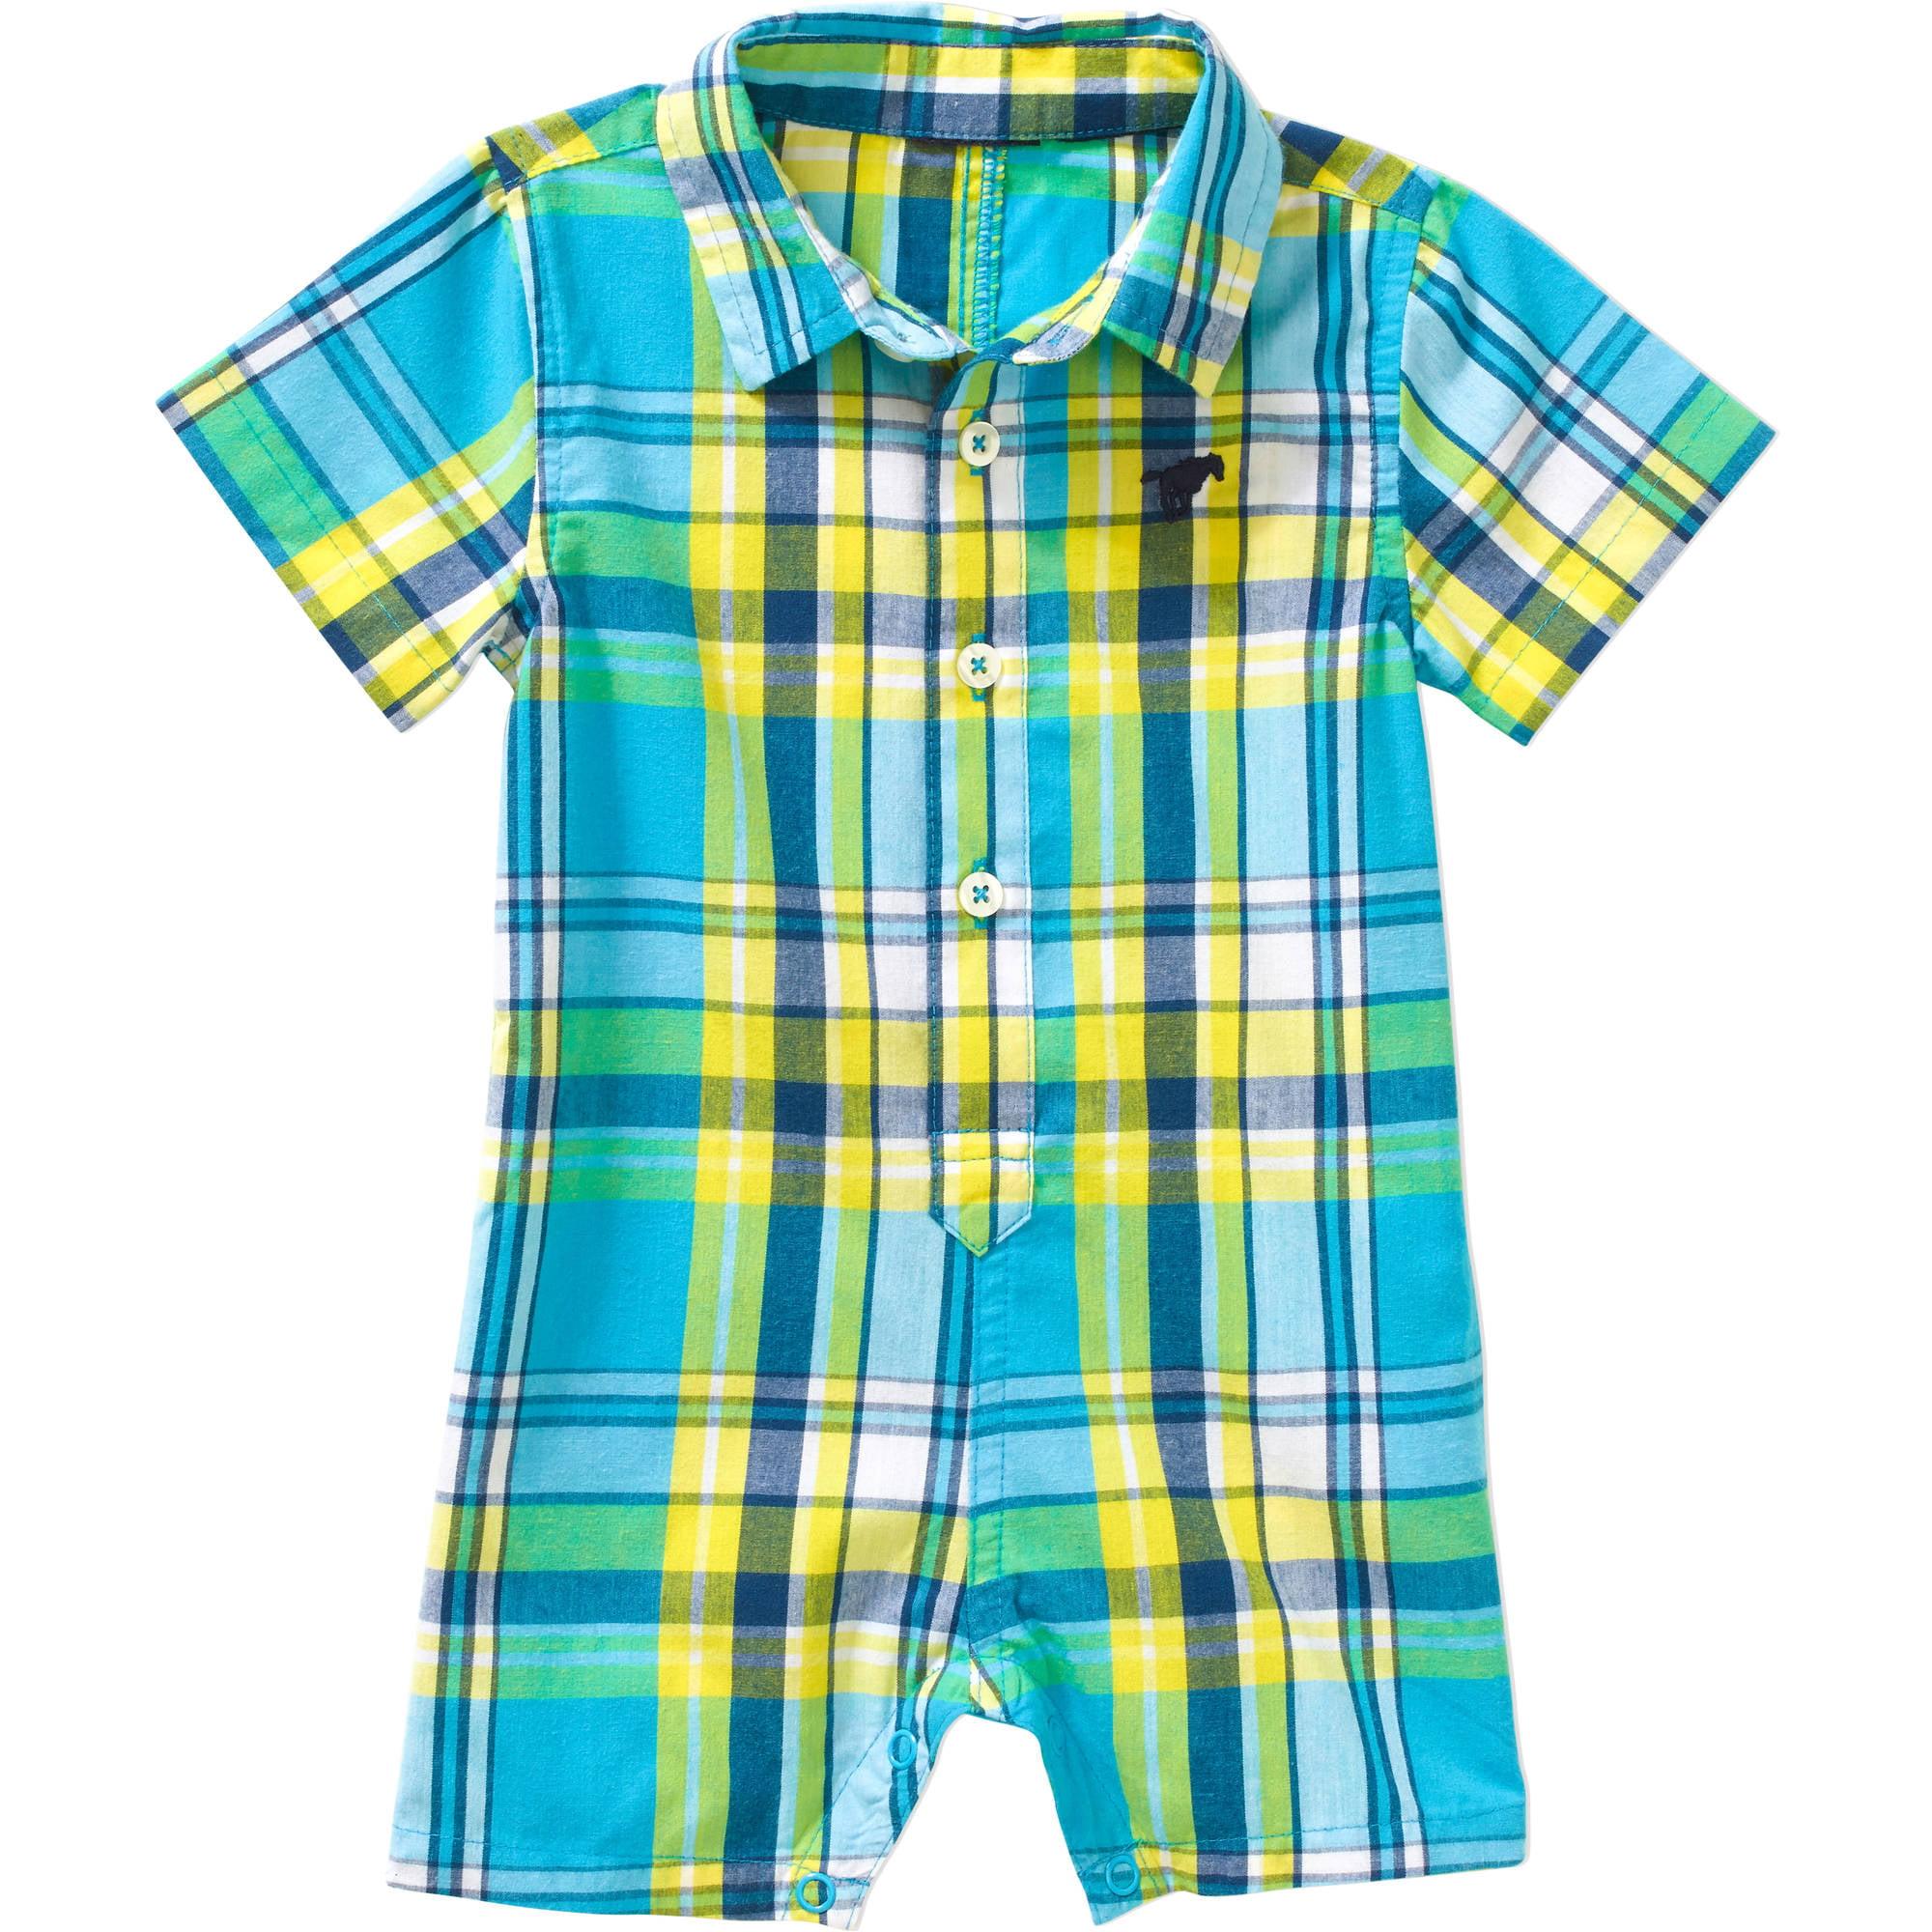 Newborn Baby Boy Woven Romper - Walmart.com